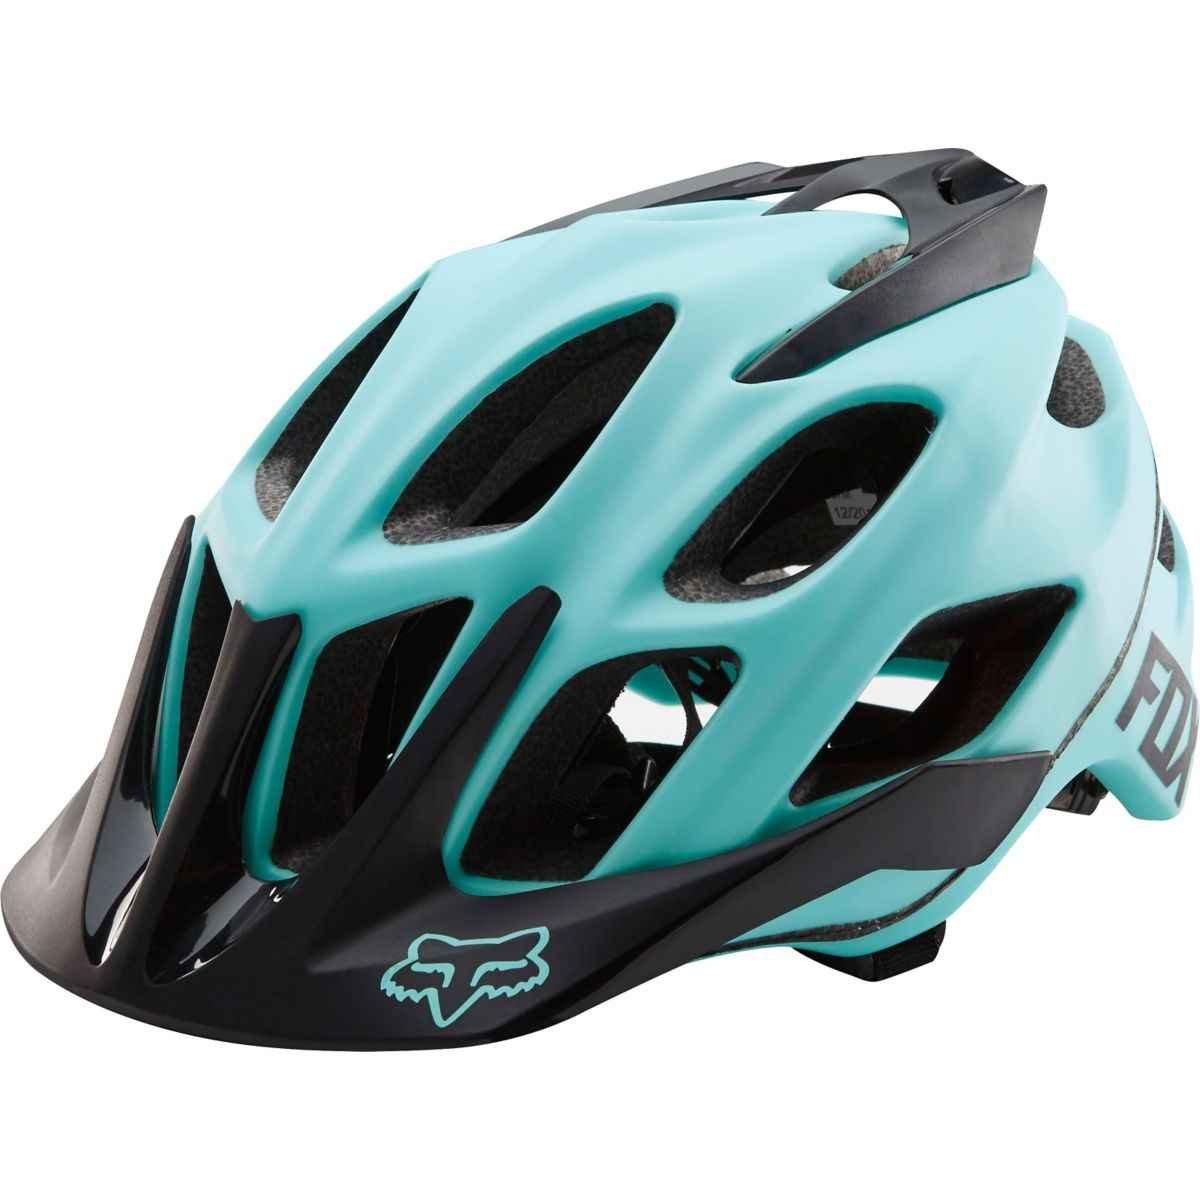 17764 Replacement Visor Fox Flux MTB Helmet